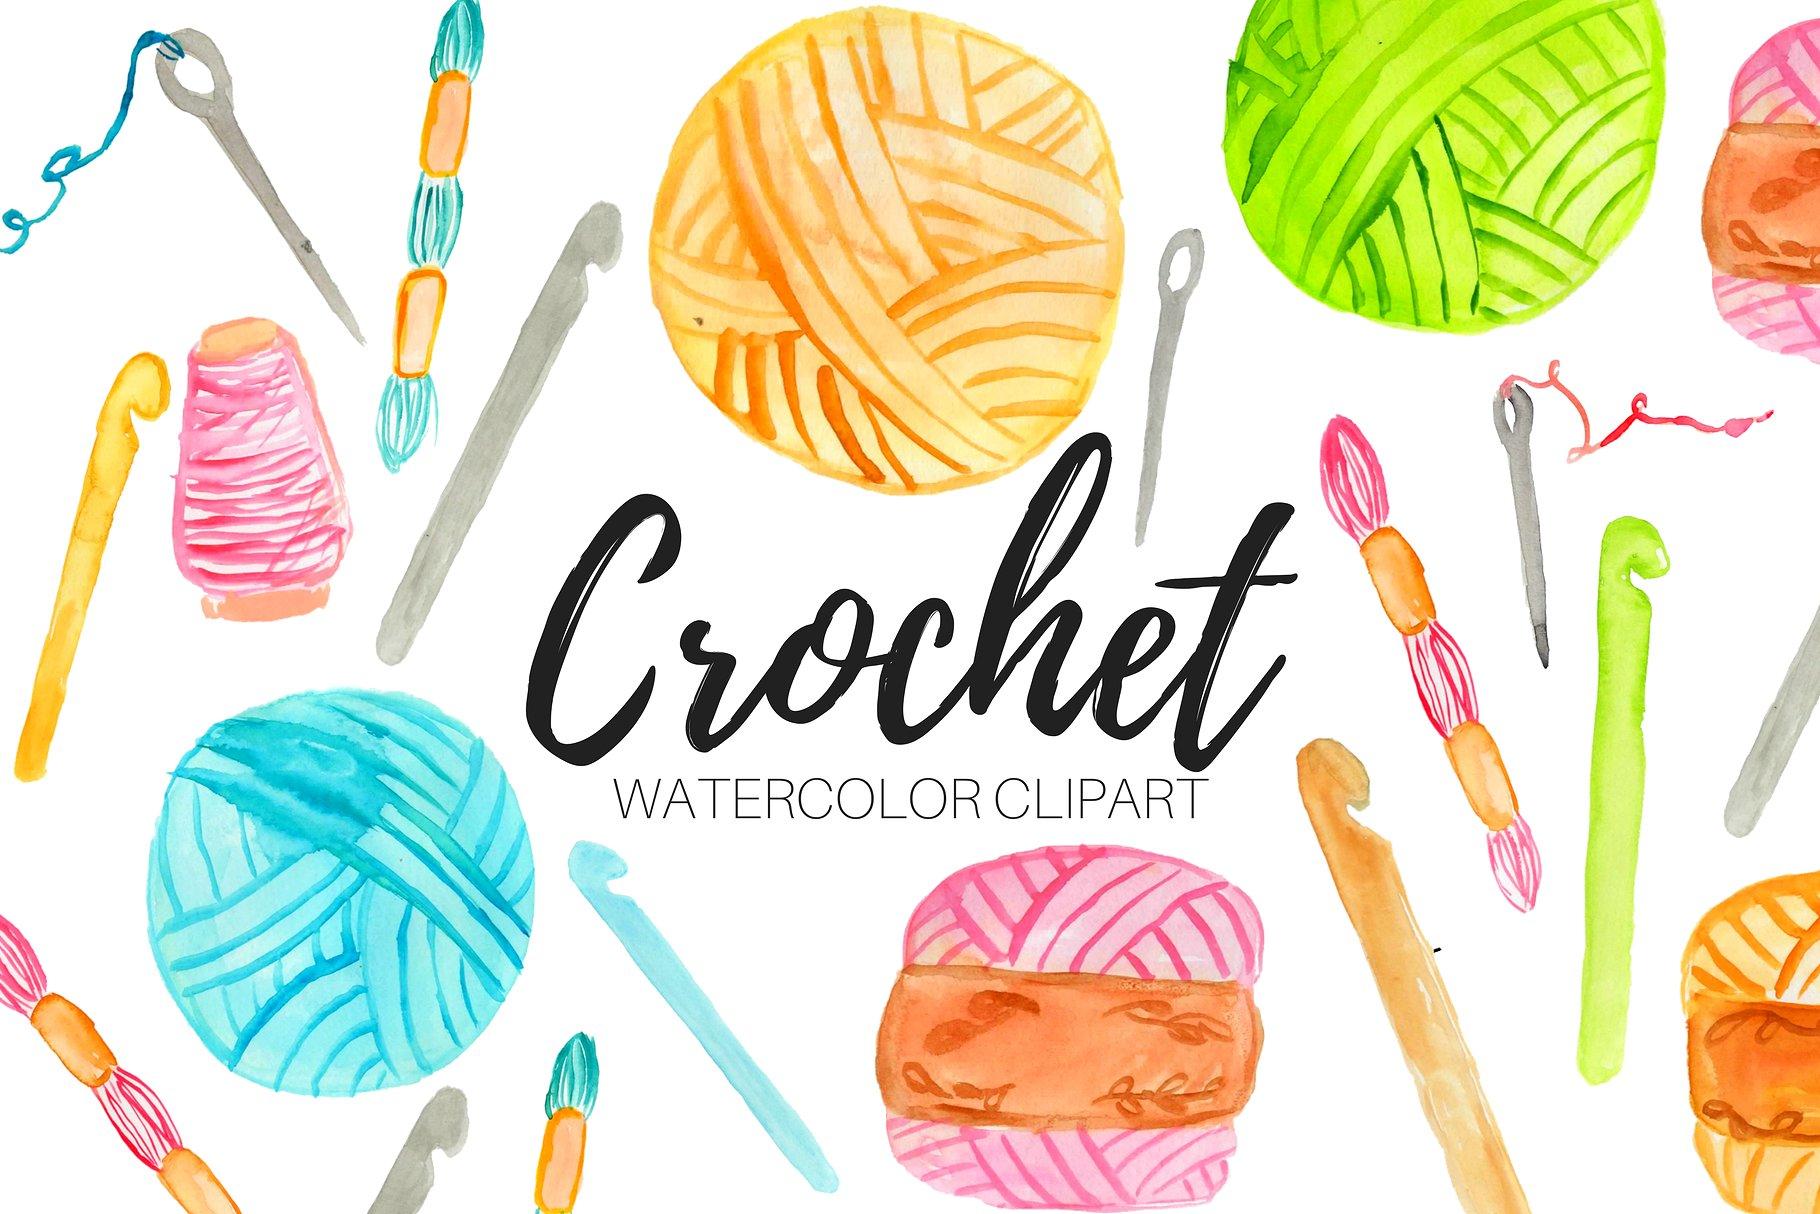 Watercolor illustrations creative market. Crochet clipart